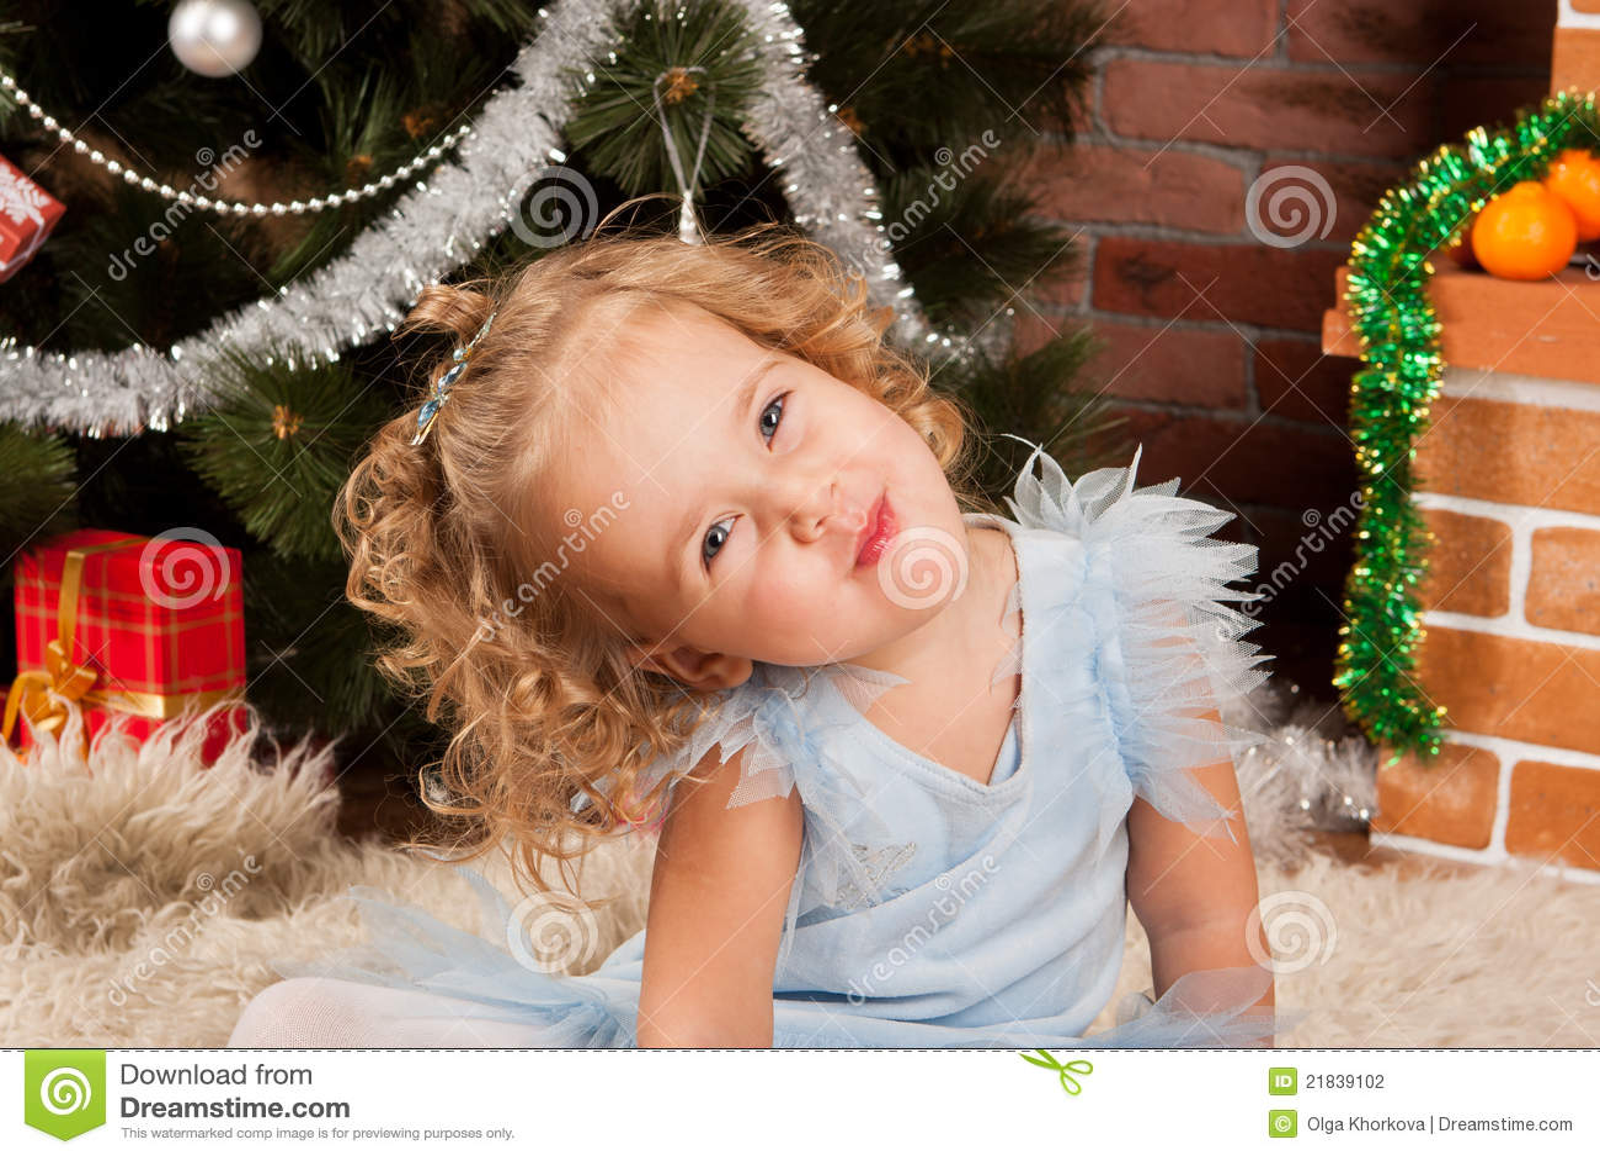 Little Girl Sitting Near Christmas Tree Stock Photo